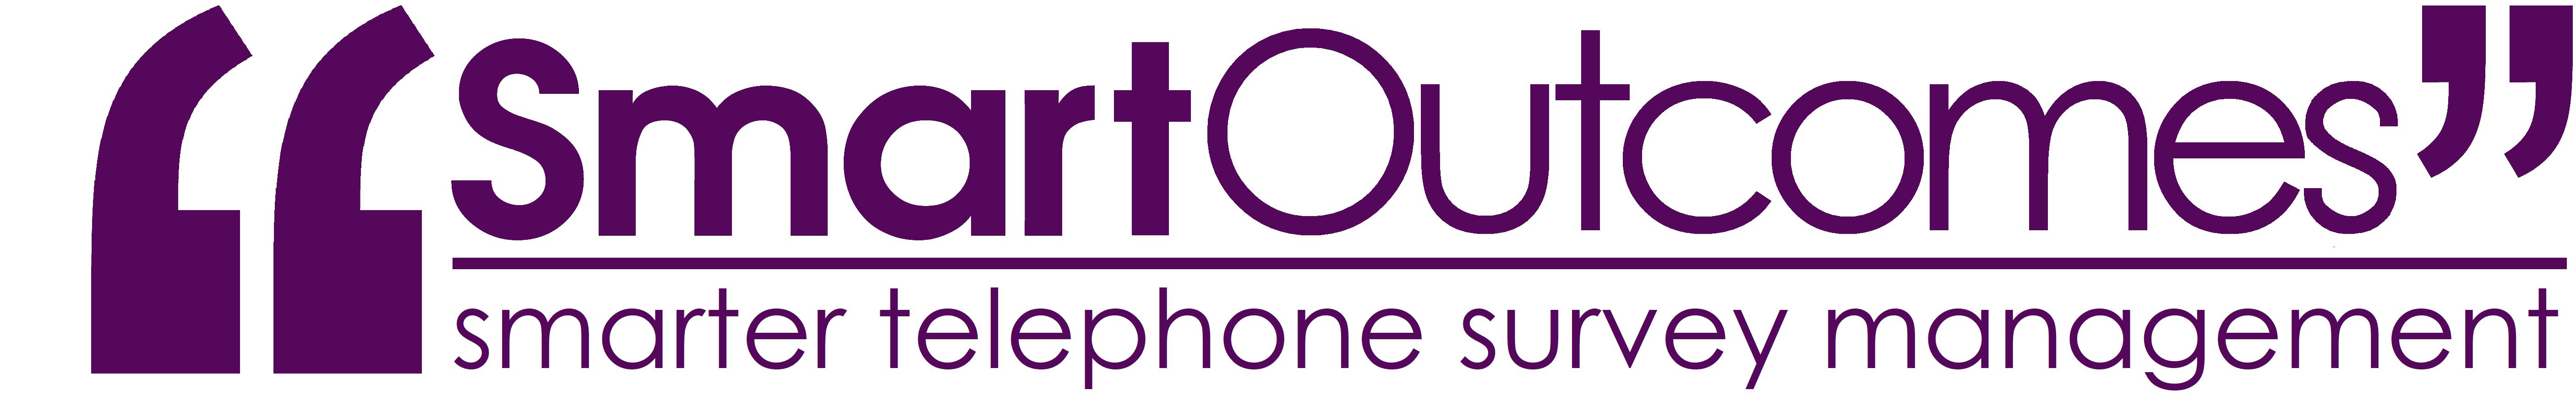 SmartOutcomes telephone survey management software